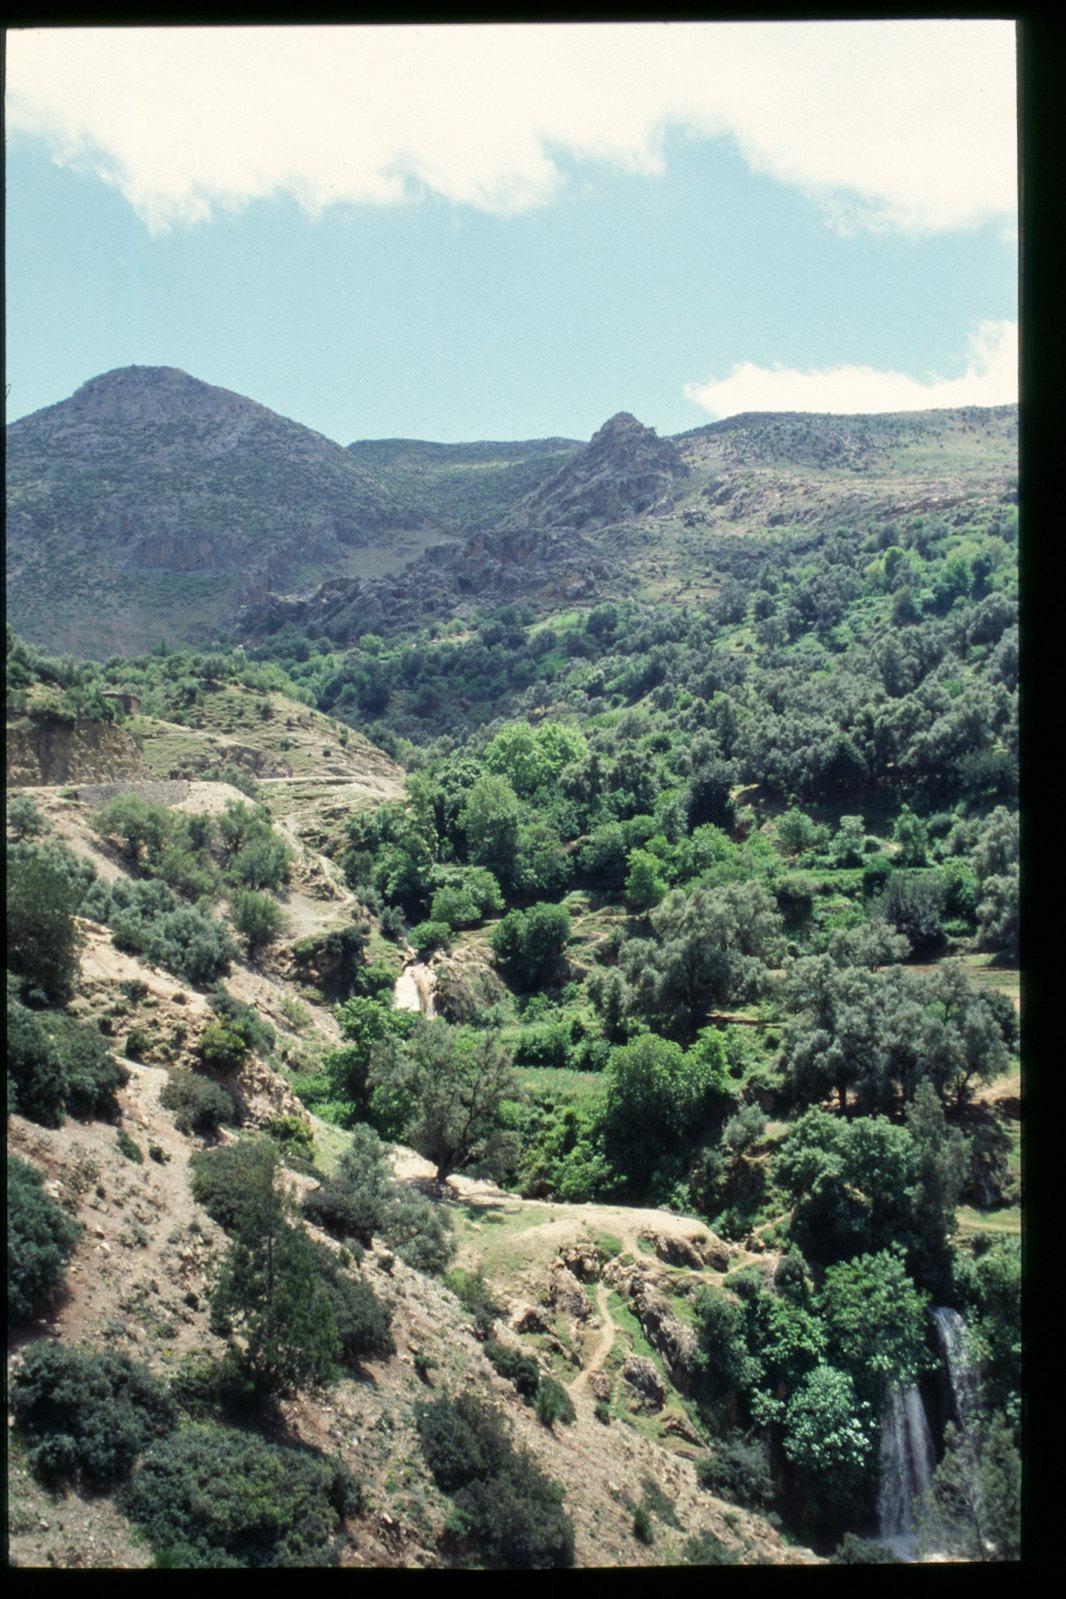 Maroc oriental - Dans le parc national du Tazekka